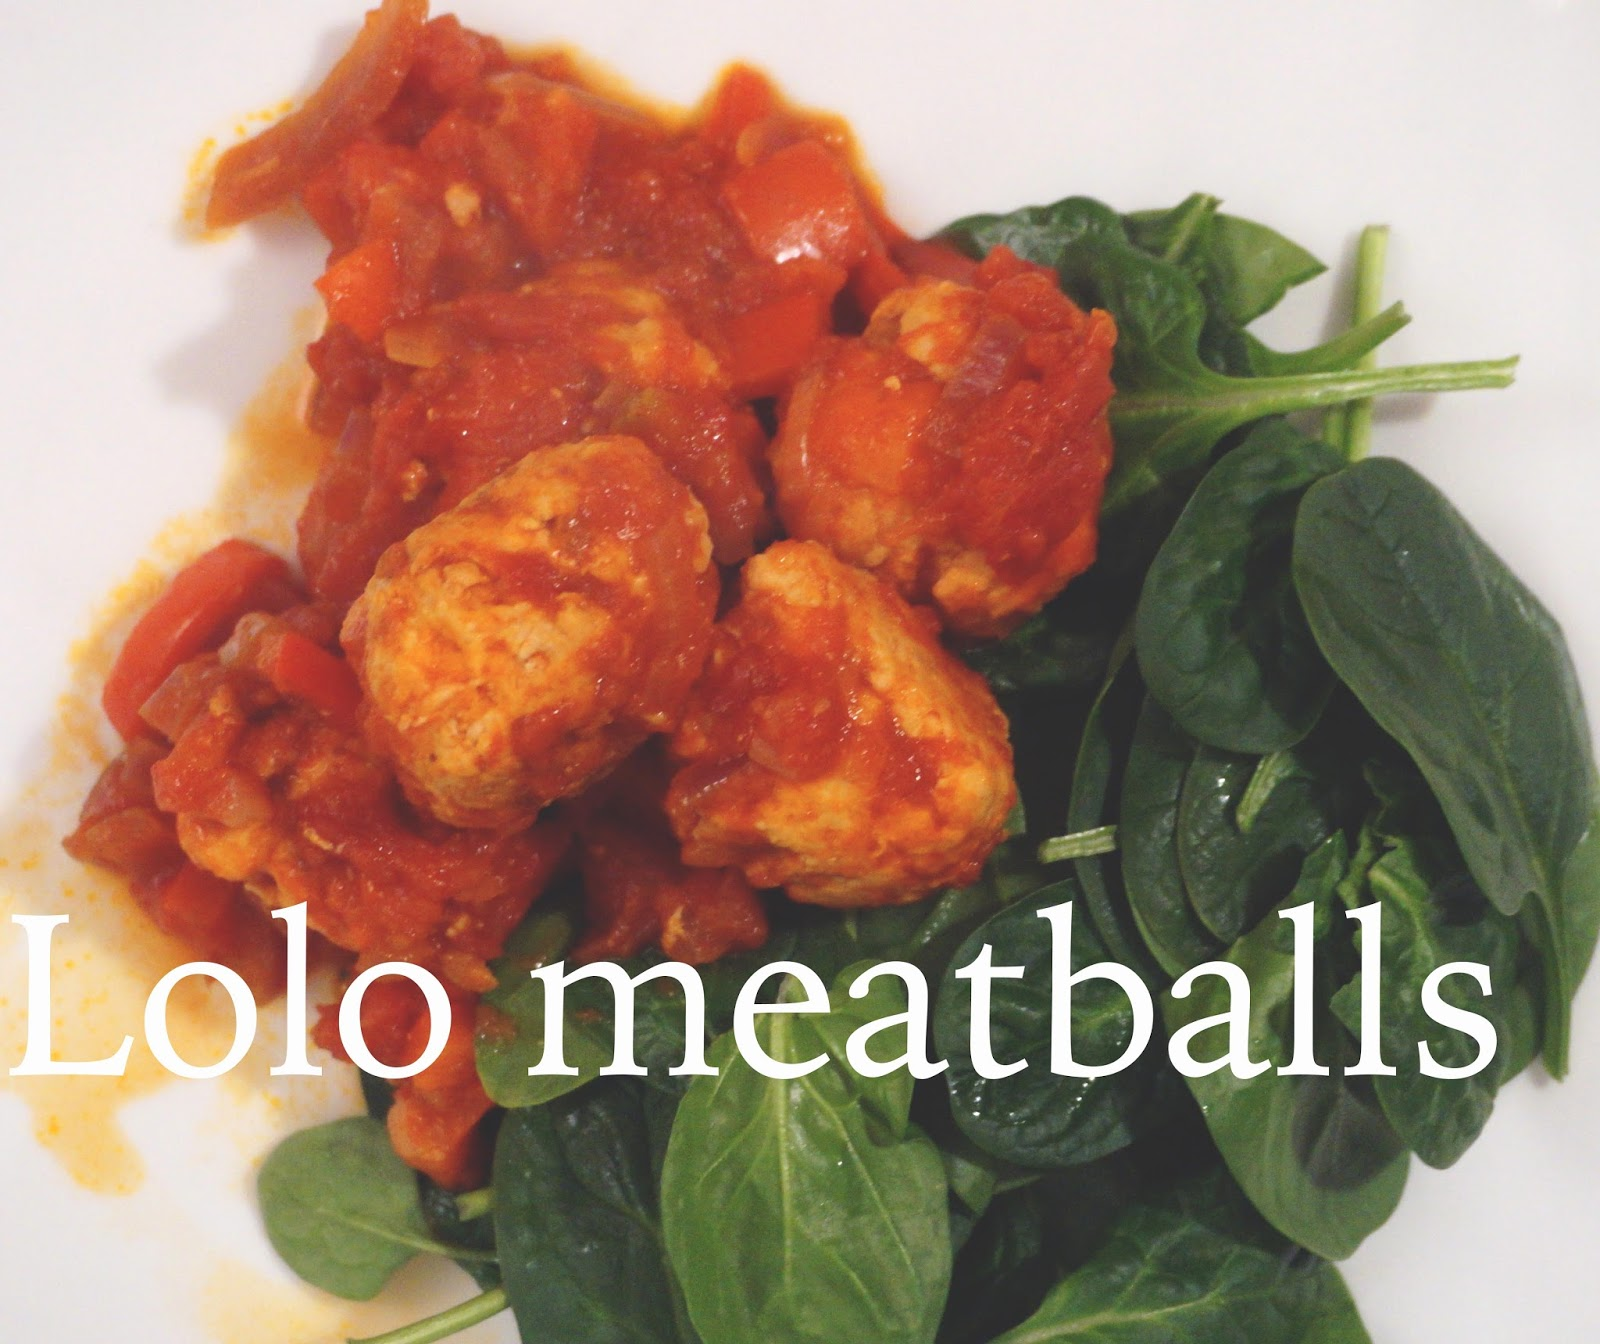 lolo+meatballs2.jpg